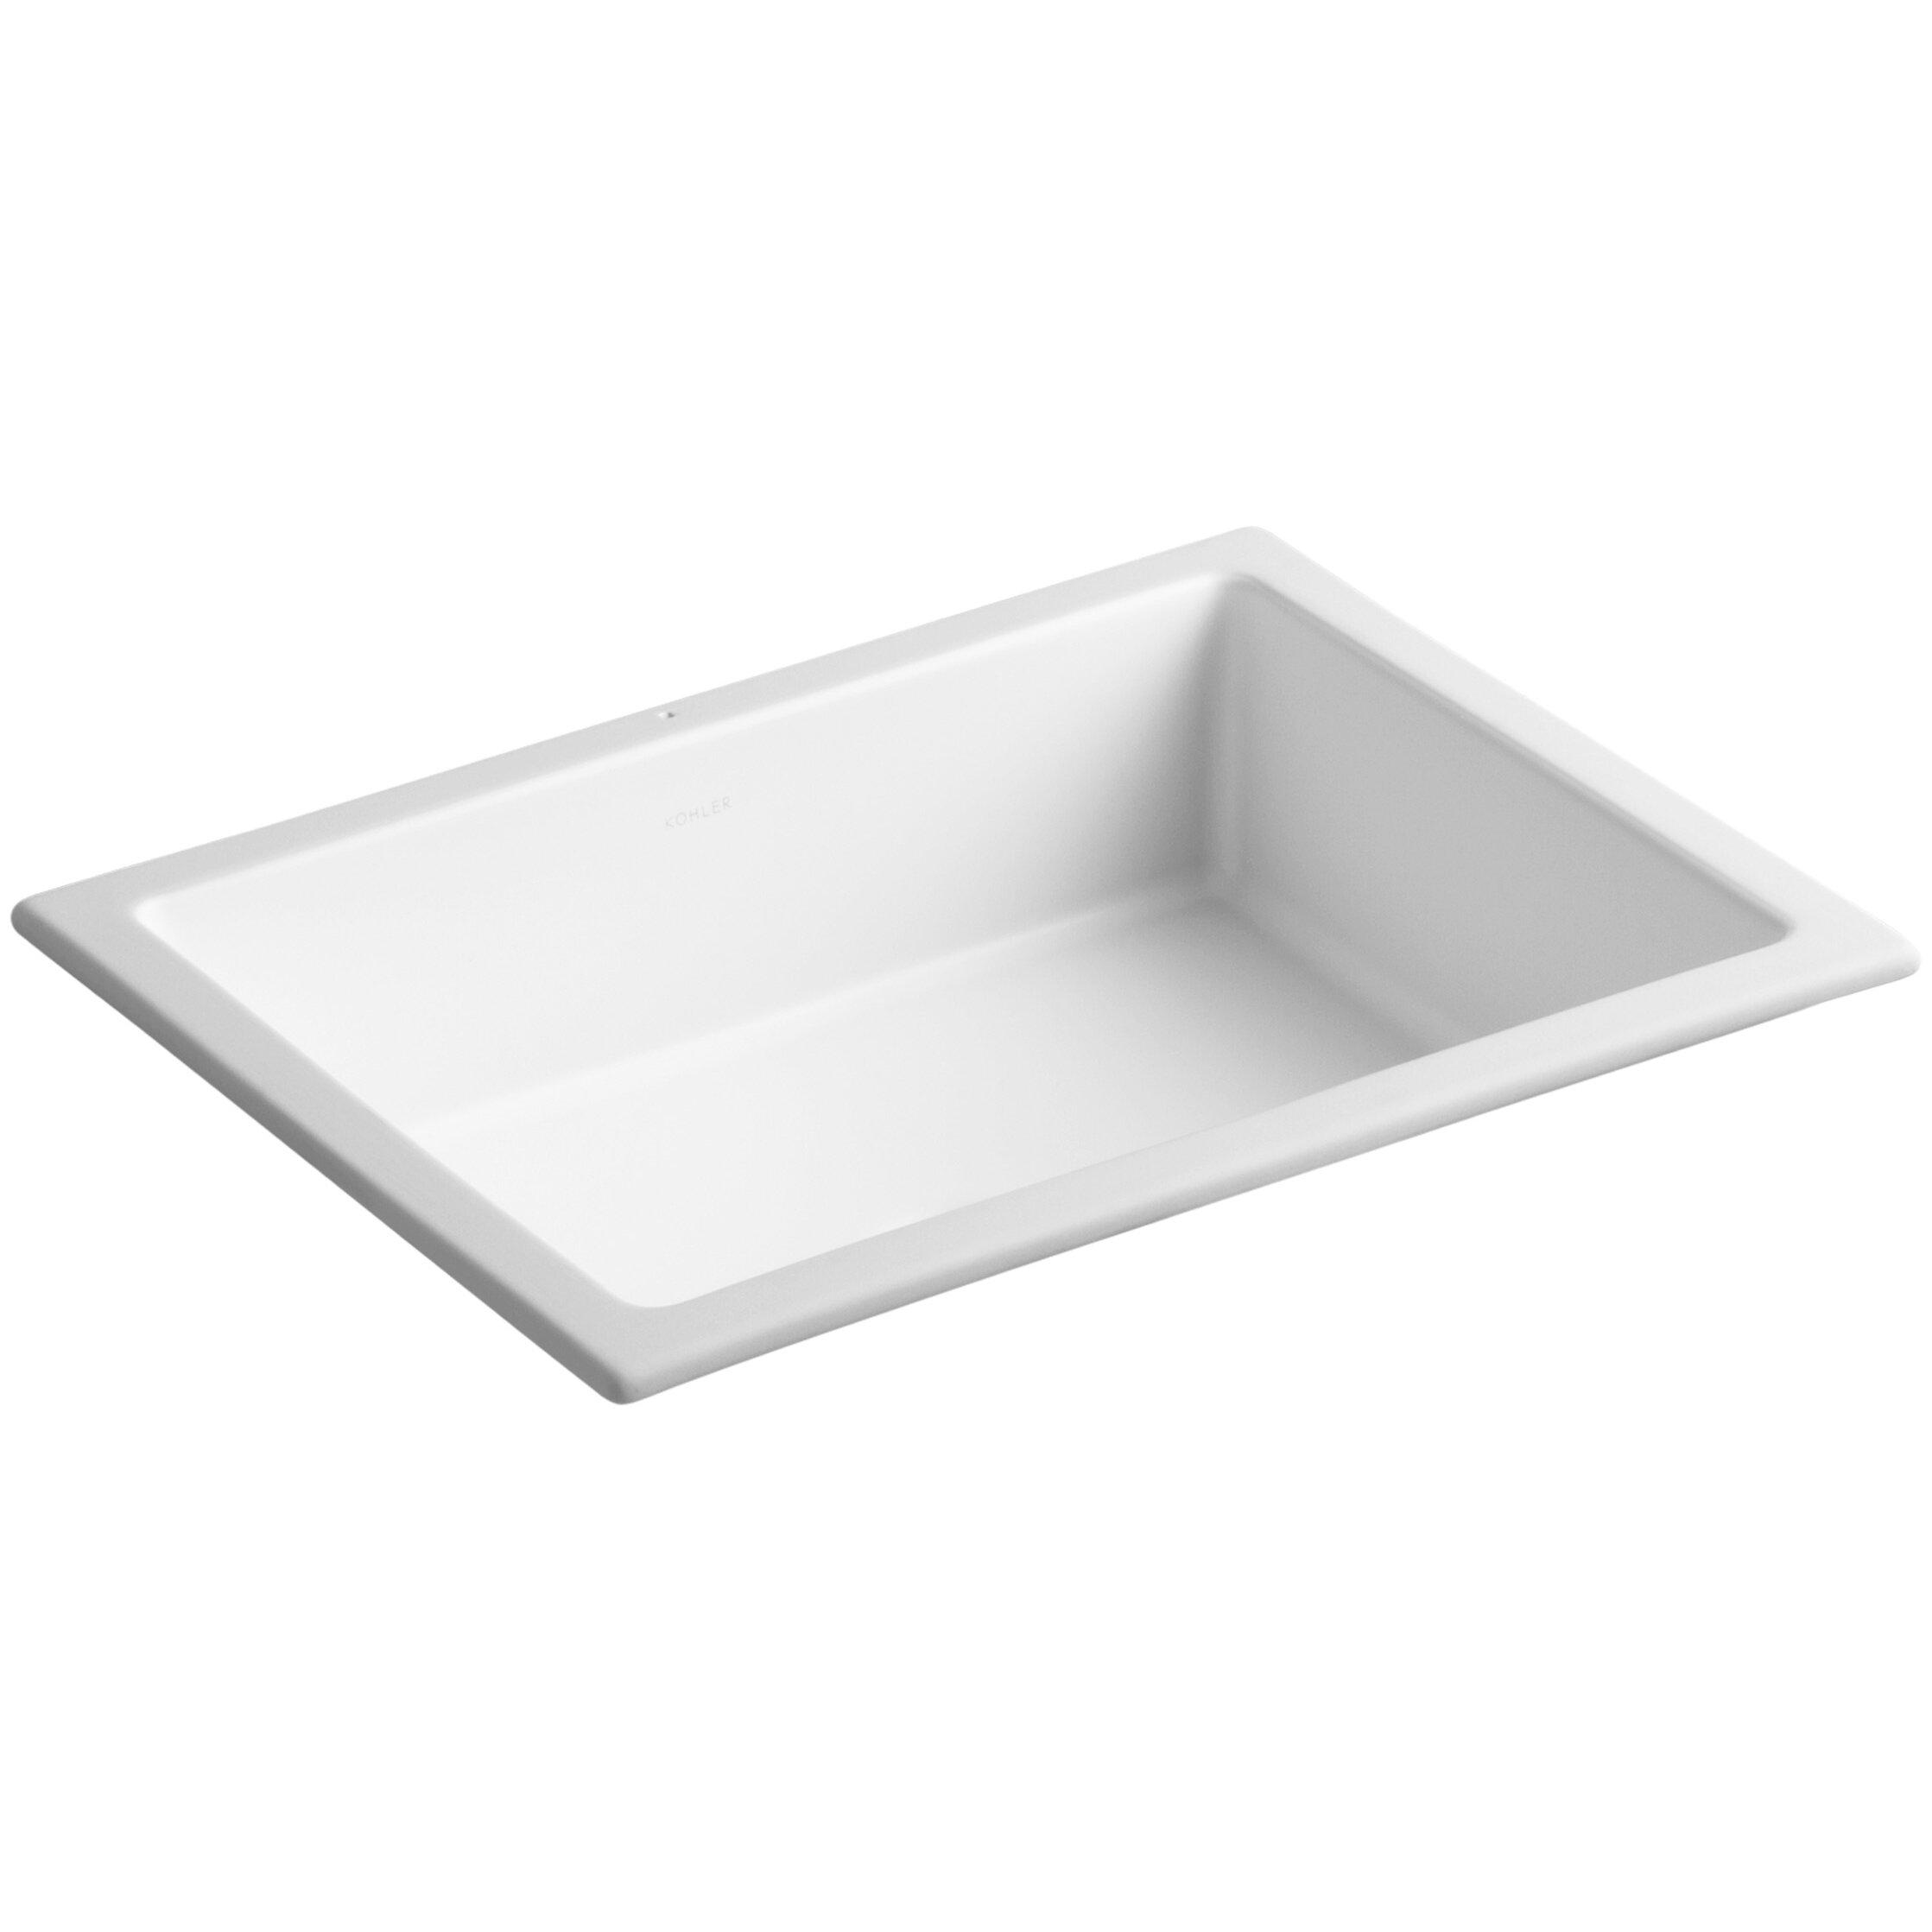 Kohler Verticyl Rectangular Undermount Bathroom Sink with Overflow. Kohler Verticyl Rectangular Undermount Bathroom Sink with Overflow